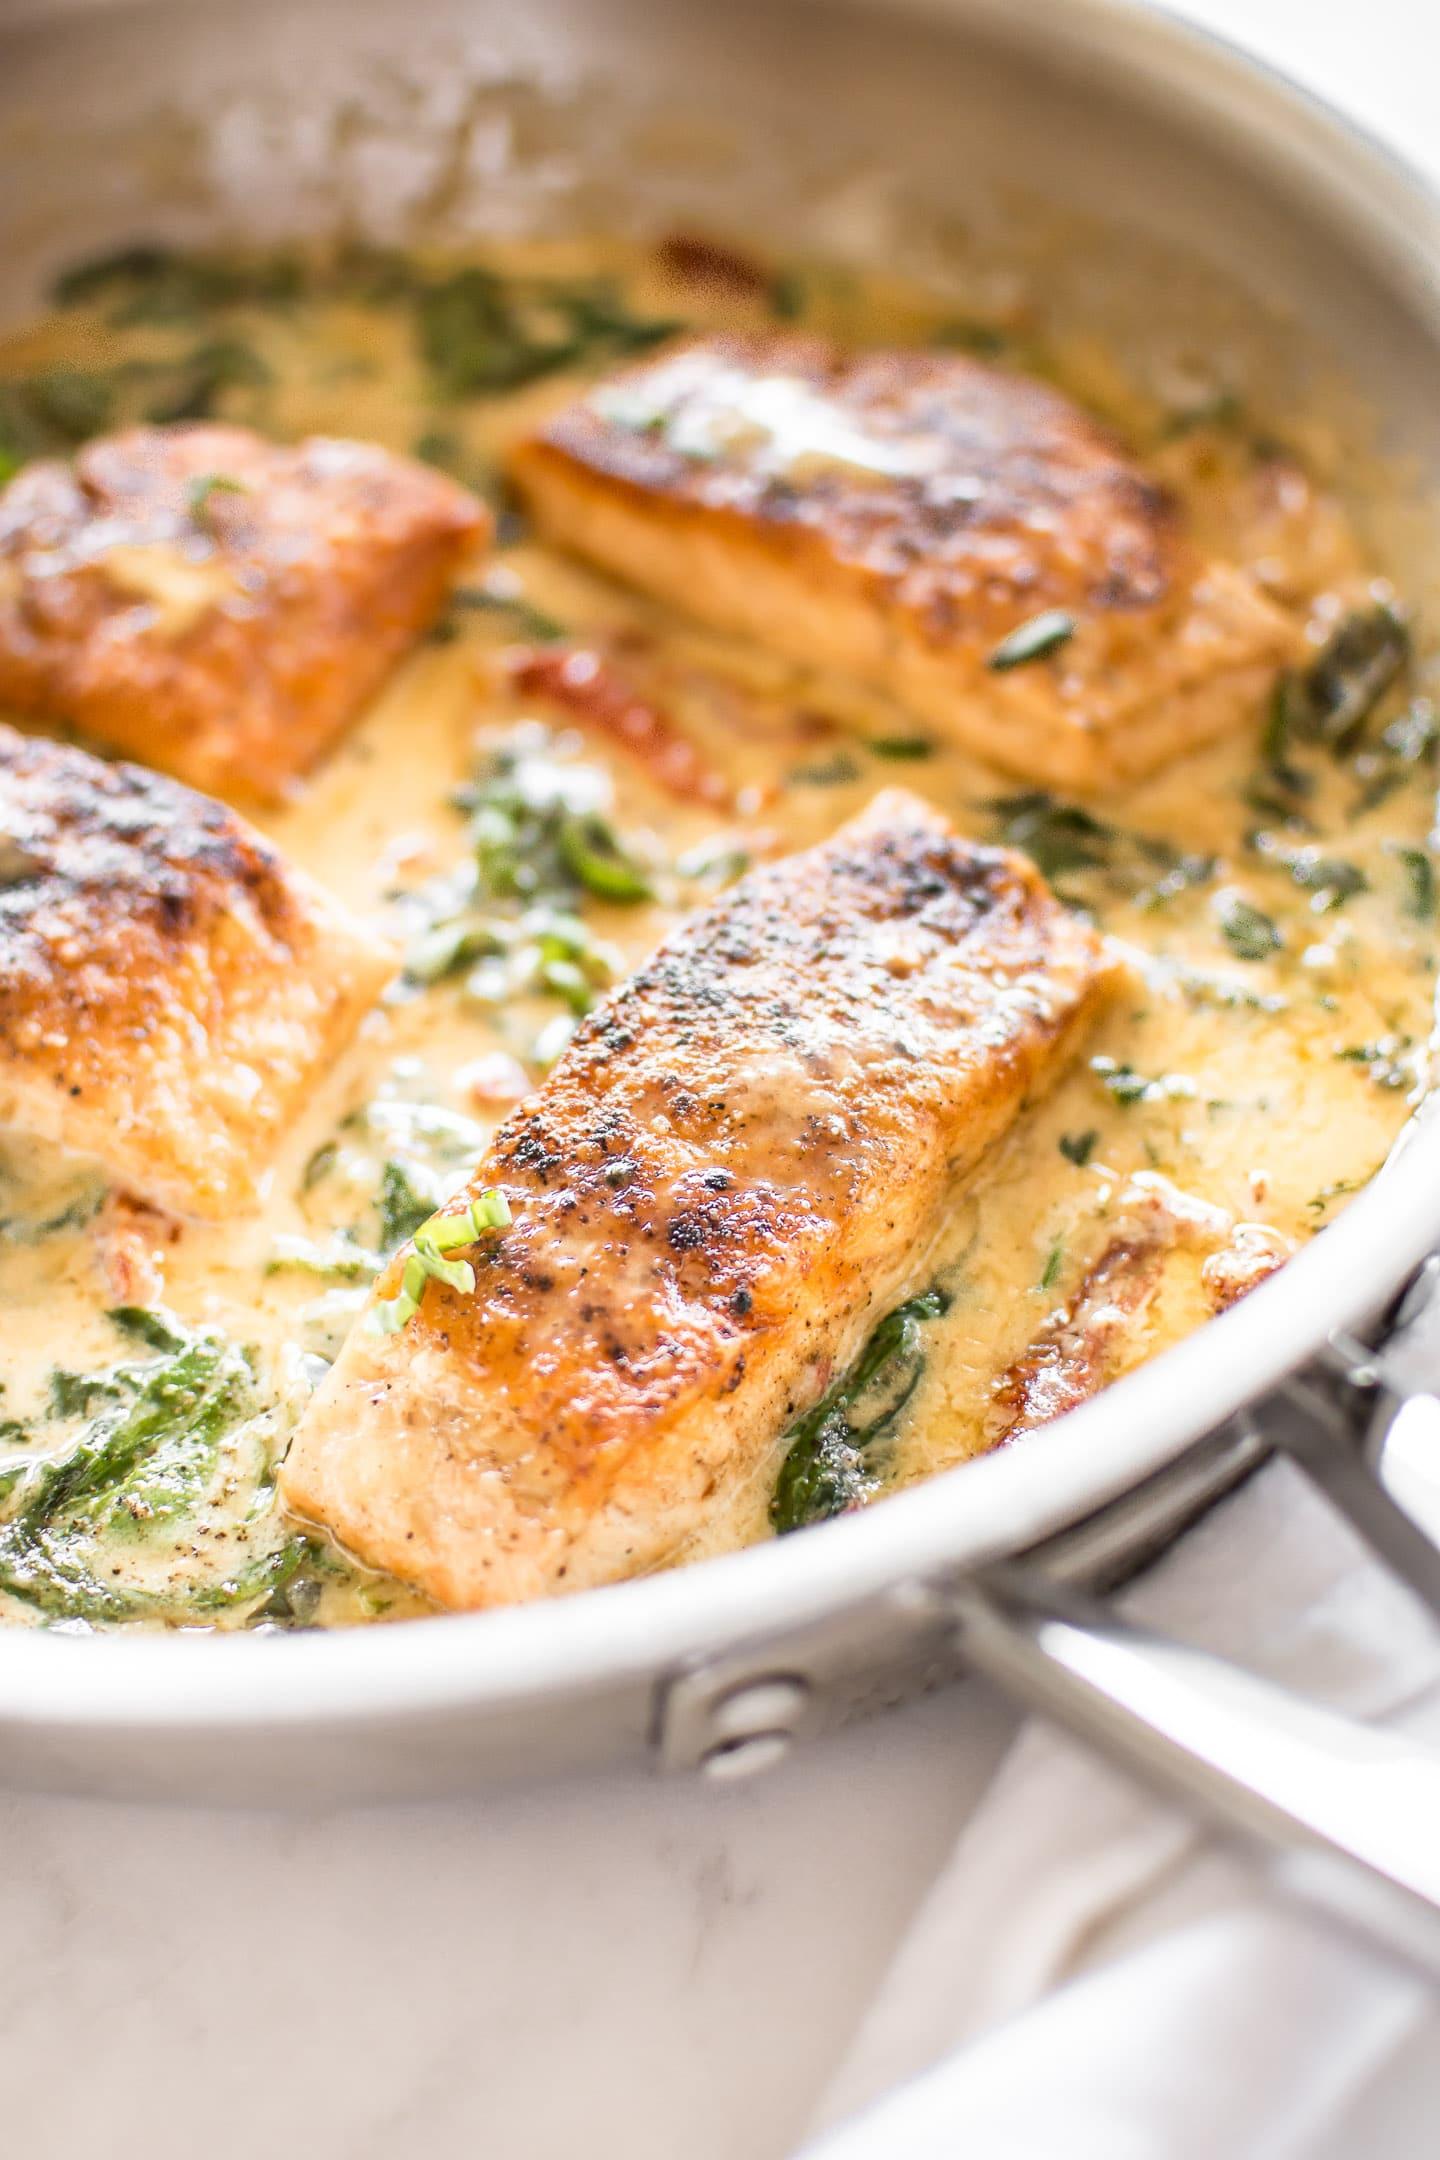 salmon recipe tuscan creamy sauce recipes dinner fish spinach tomato pan garlic pasta seared sun chicken cream food go rice